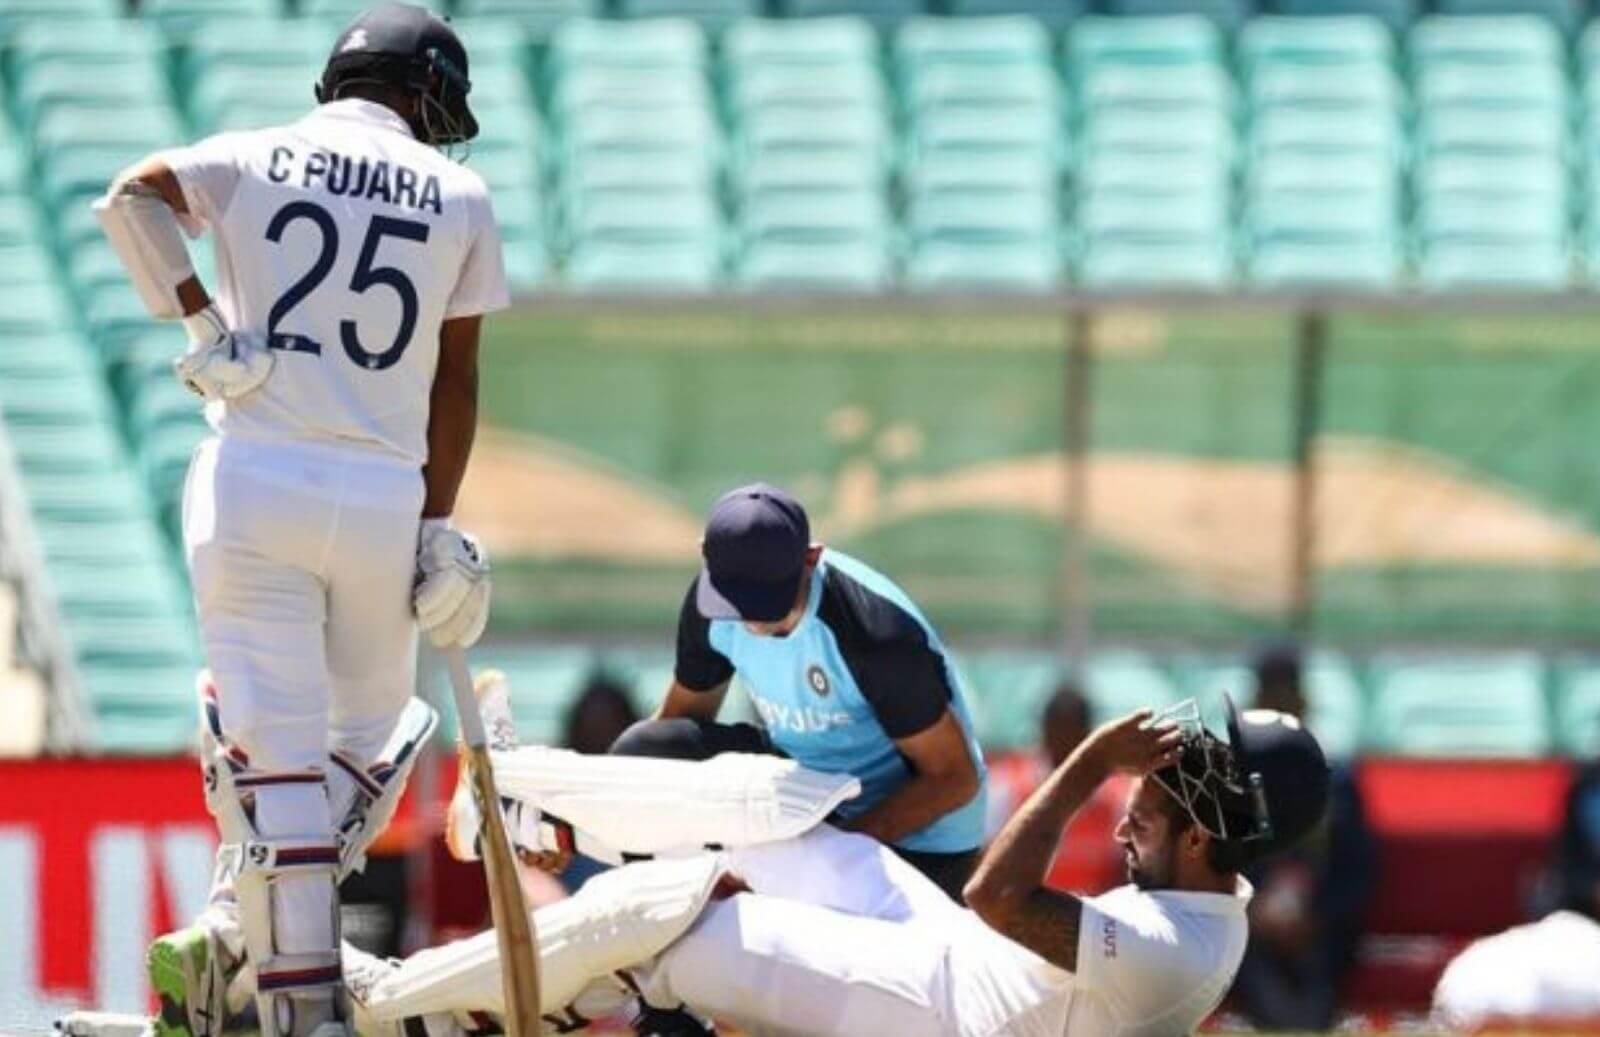 IND vs AUS 2021: List Of India Cricketers Injured During Border-Gavaskar Trophy 2020-21